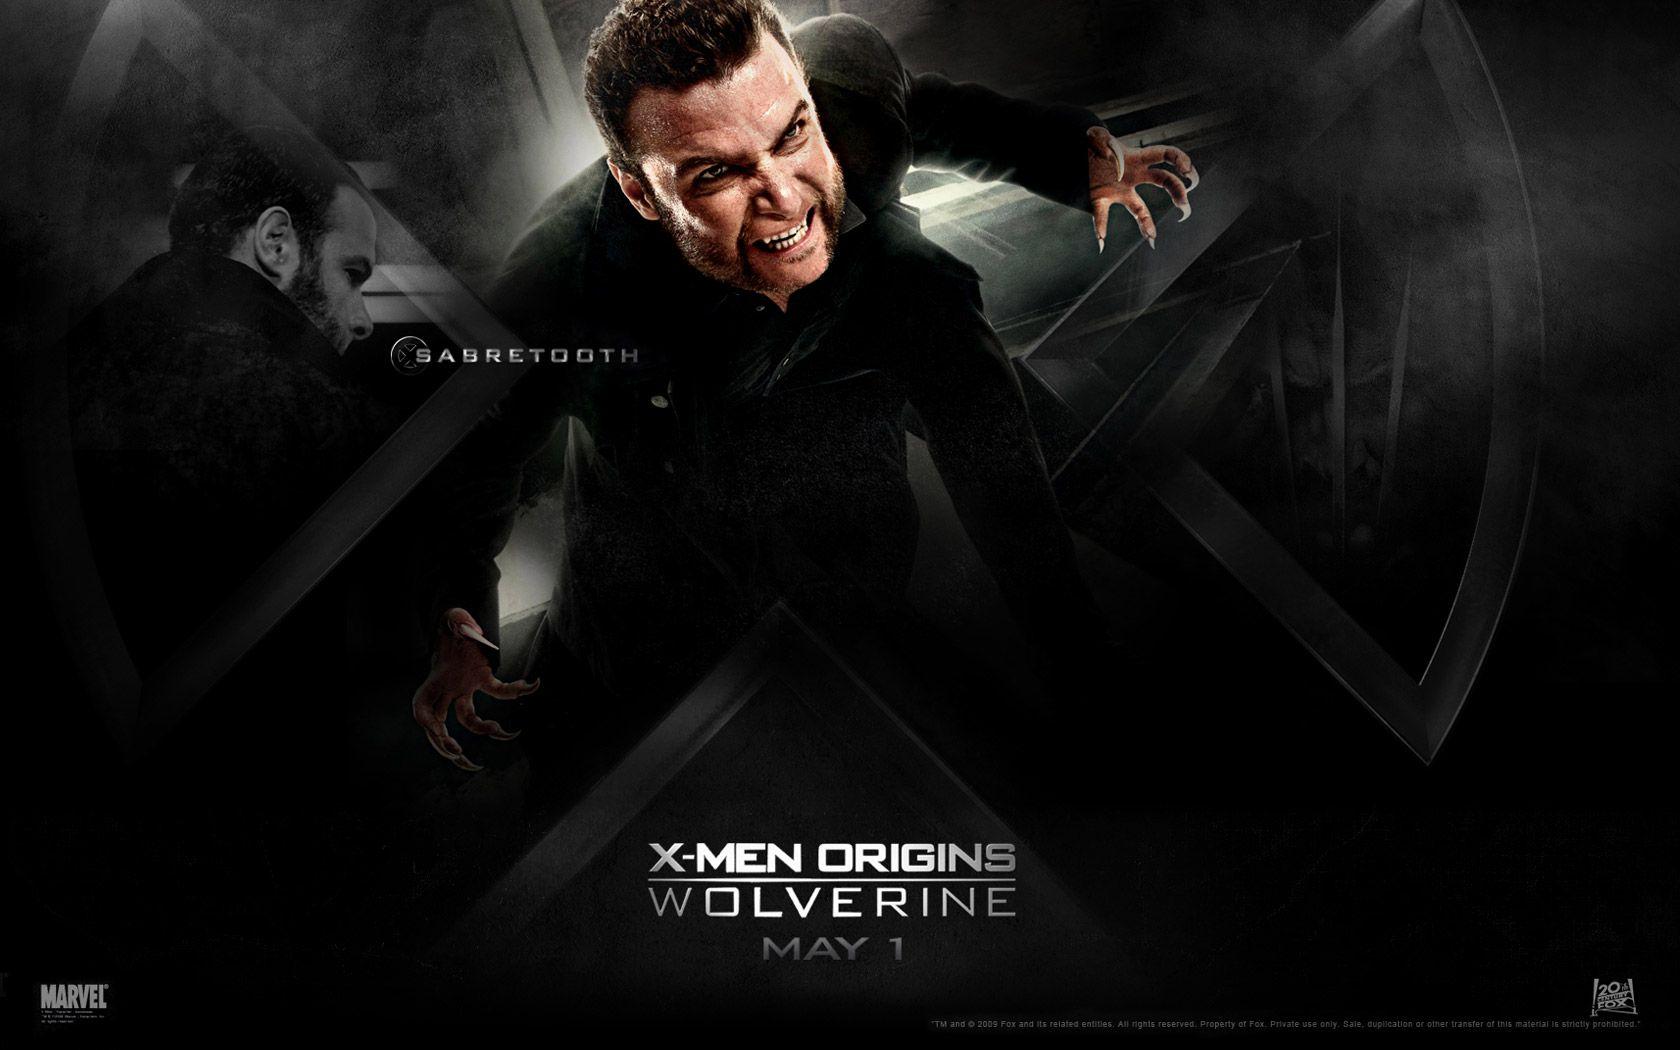 X Men Origins Wolverine 2009 Marvel Comics Films 1680x1050 Wallpaper 3 Victor Creed Wolverine Movie X Men